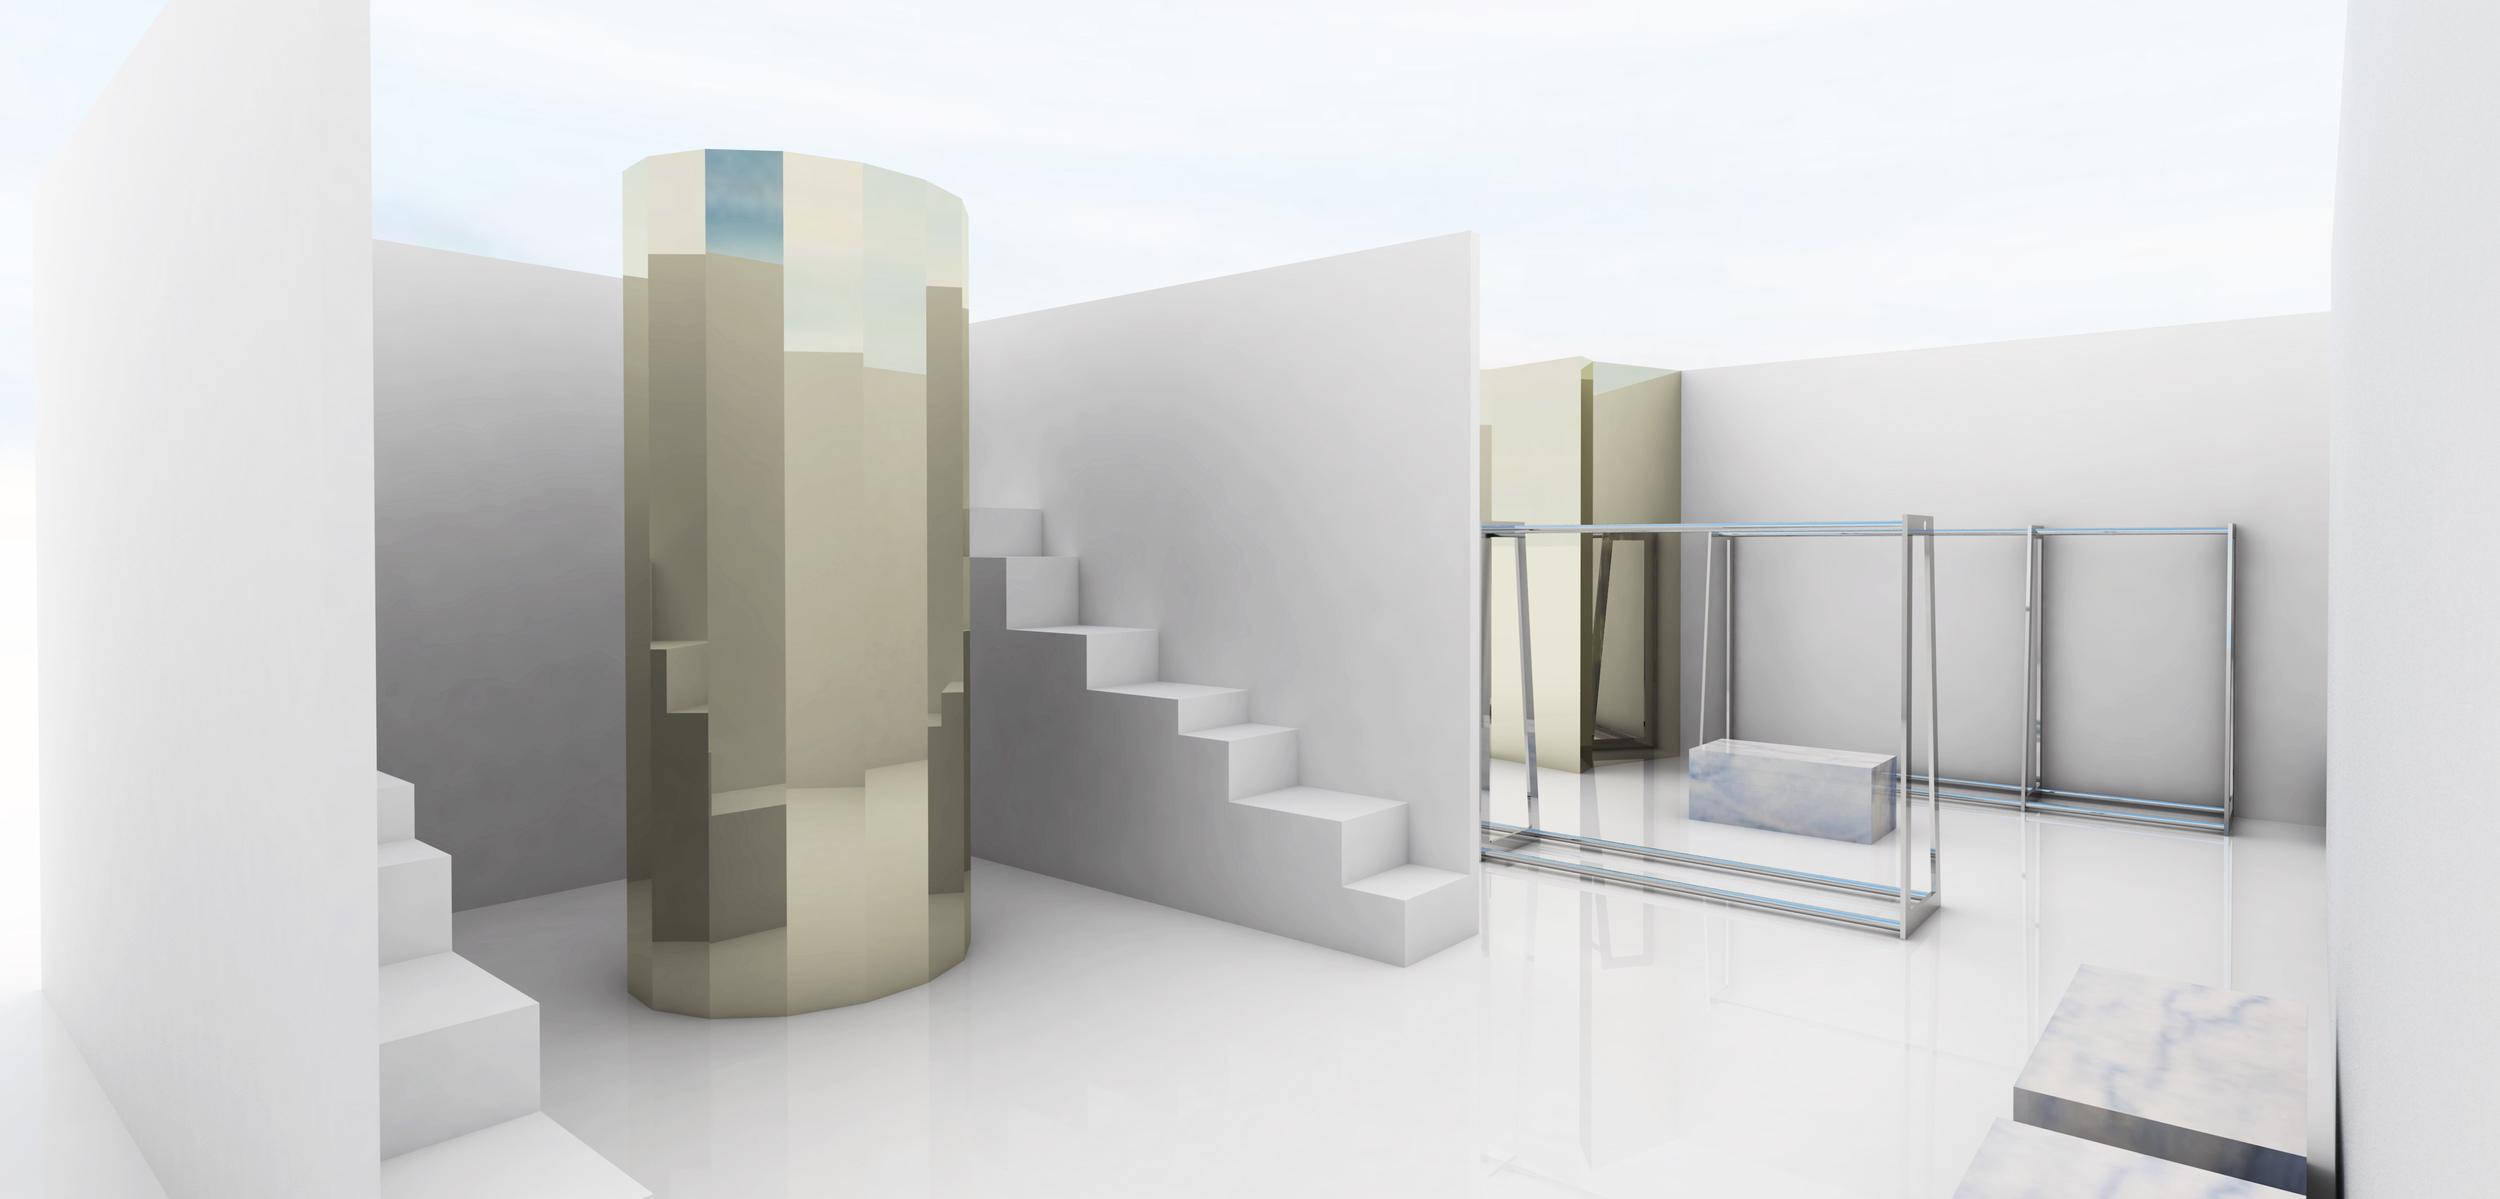 Céline store architecte study studio Henry